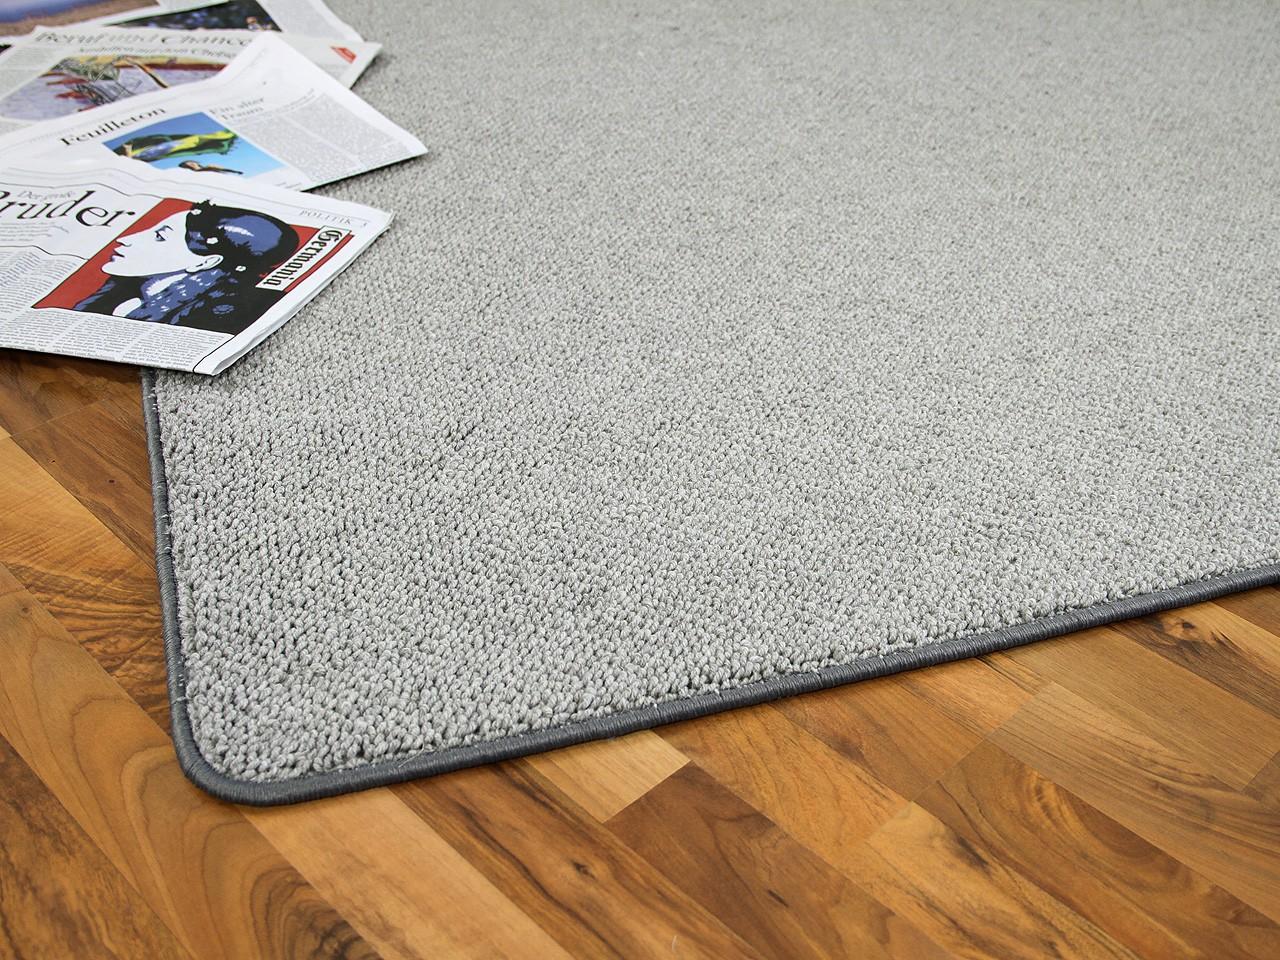 natur teppich luxus berber venice hellgrau abverkauf teppiche sisal und naturteppiche berber. Black Bedroom Furniture Sets. Home Design Ideas